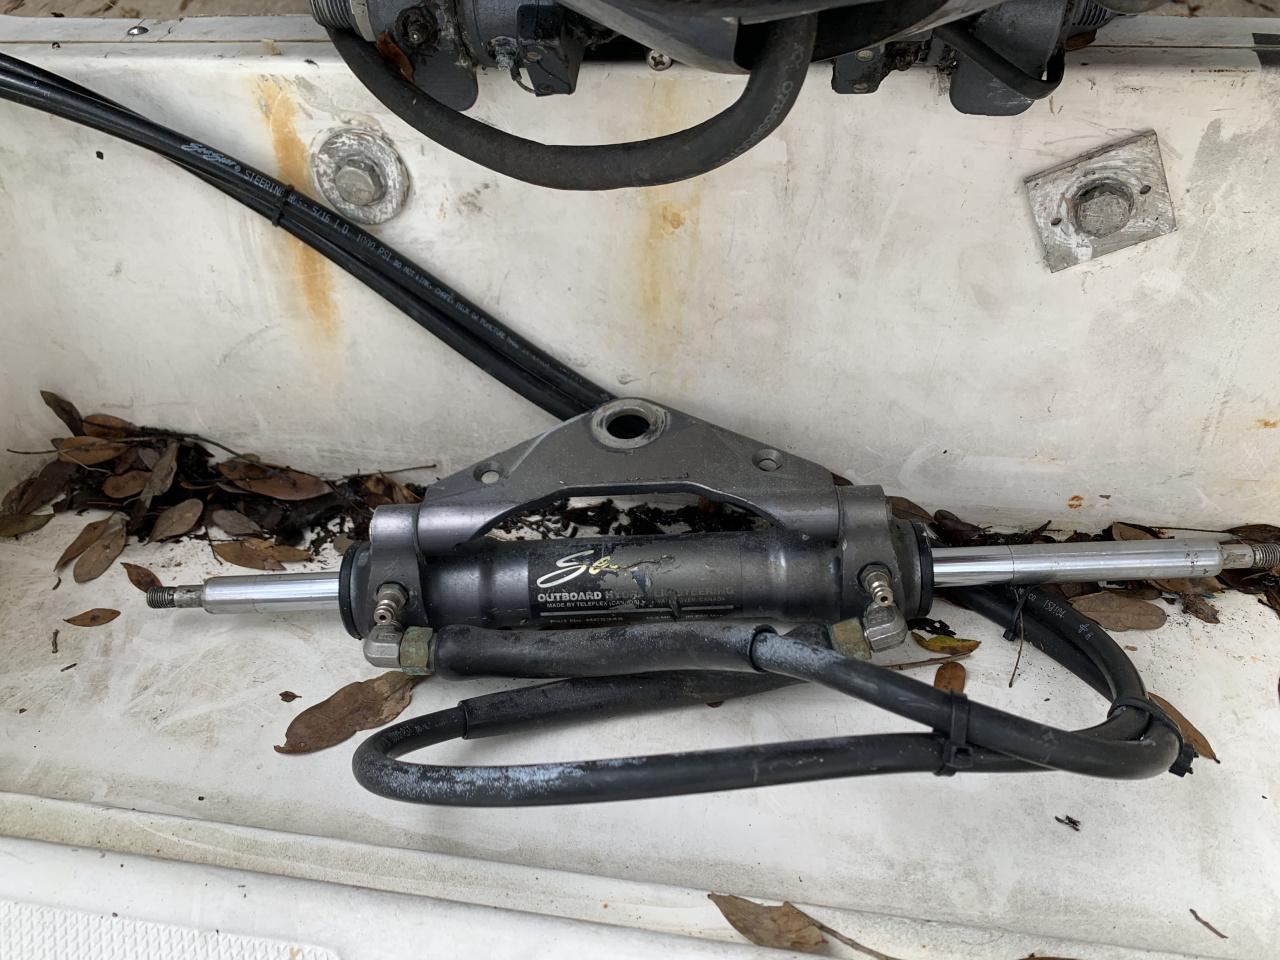 Hydraulic steering-9b19a6f7-d388-461c-b5a6-088bd05c5e1a-jpg